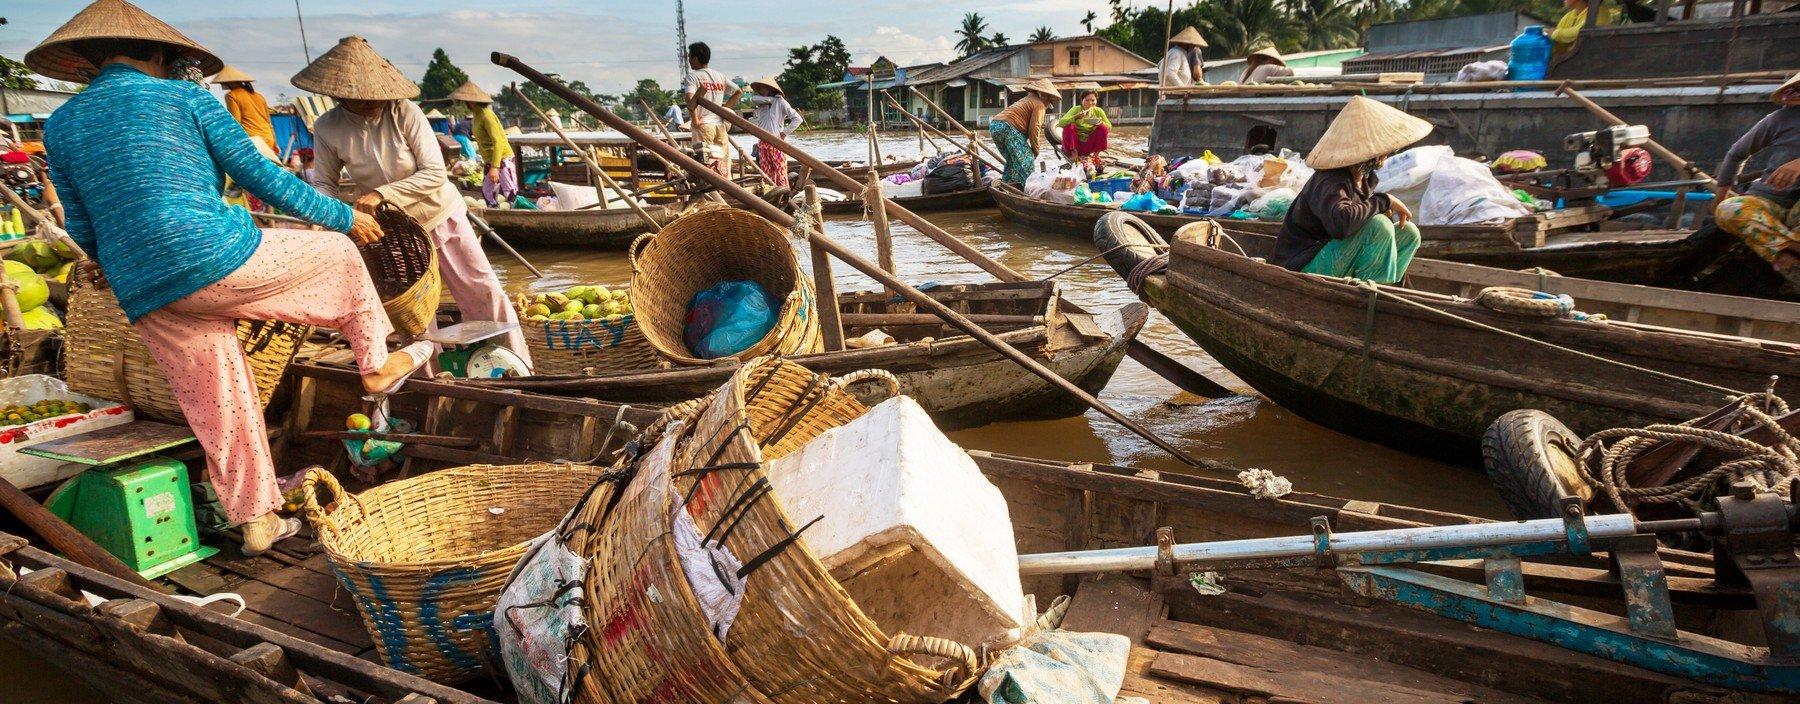 vn, mekong delta, floating market (25).jpg